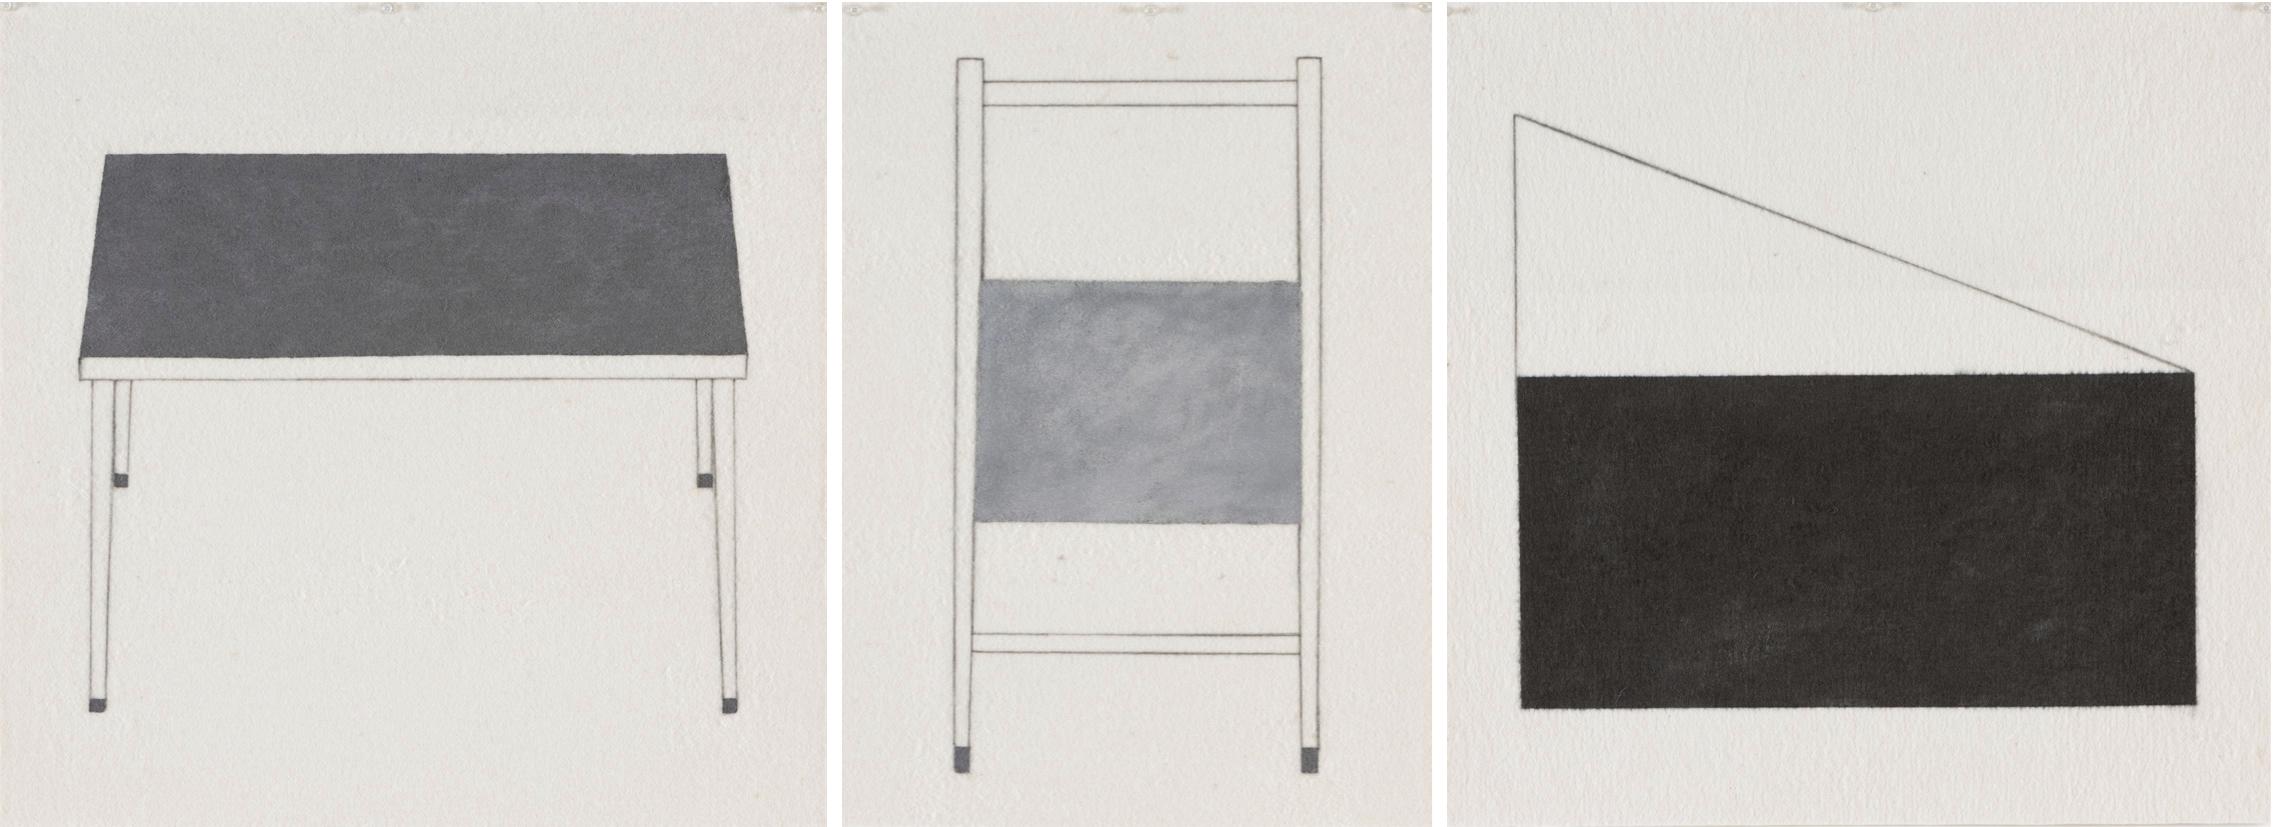 Studio Trilogy a, b, c, 2018